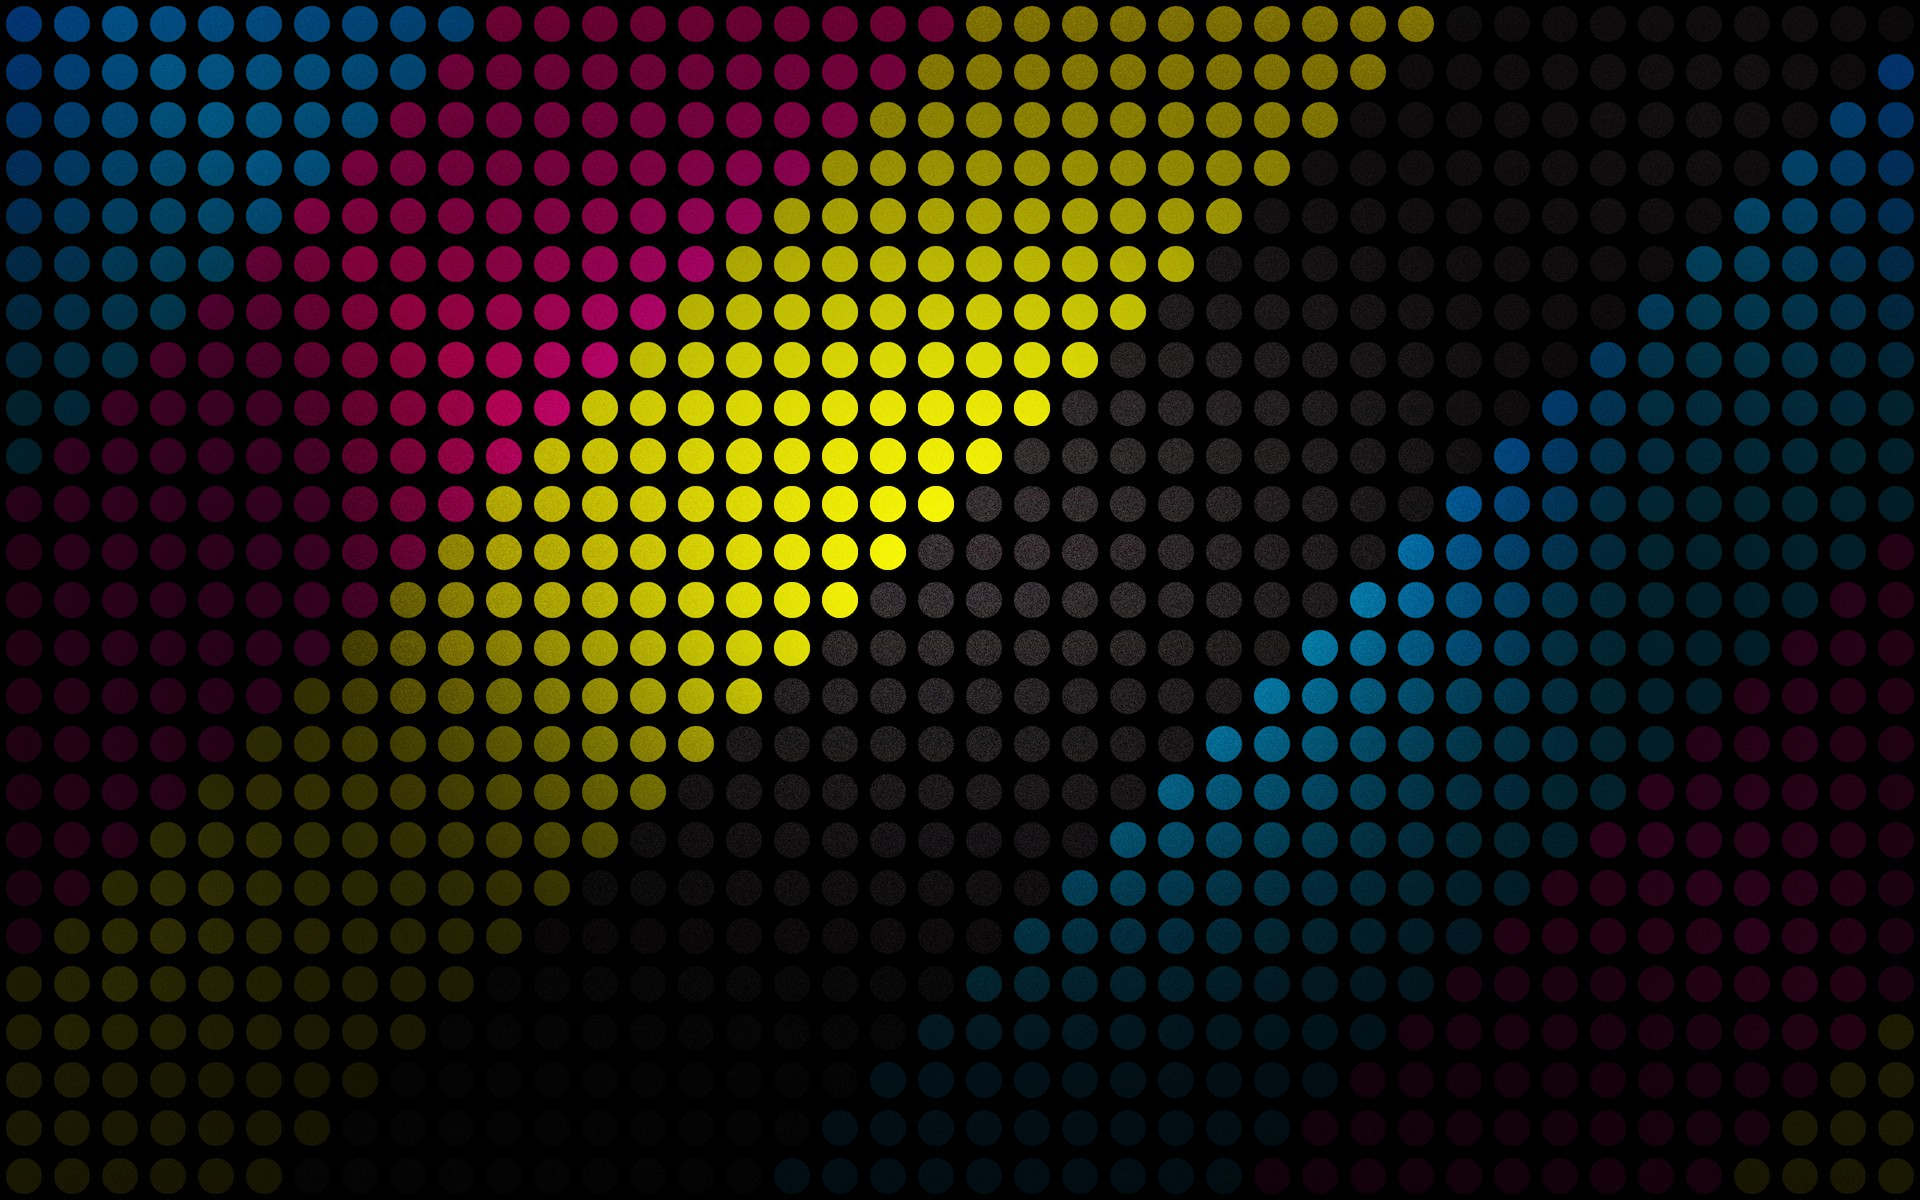 crazy wallpaper ·① download free stunning high resolution